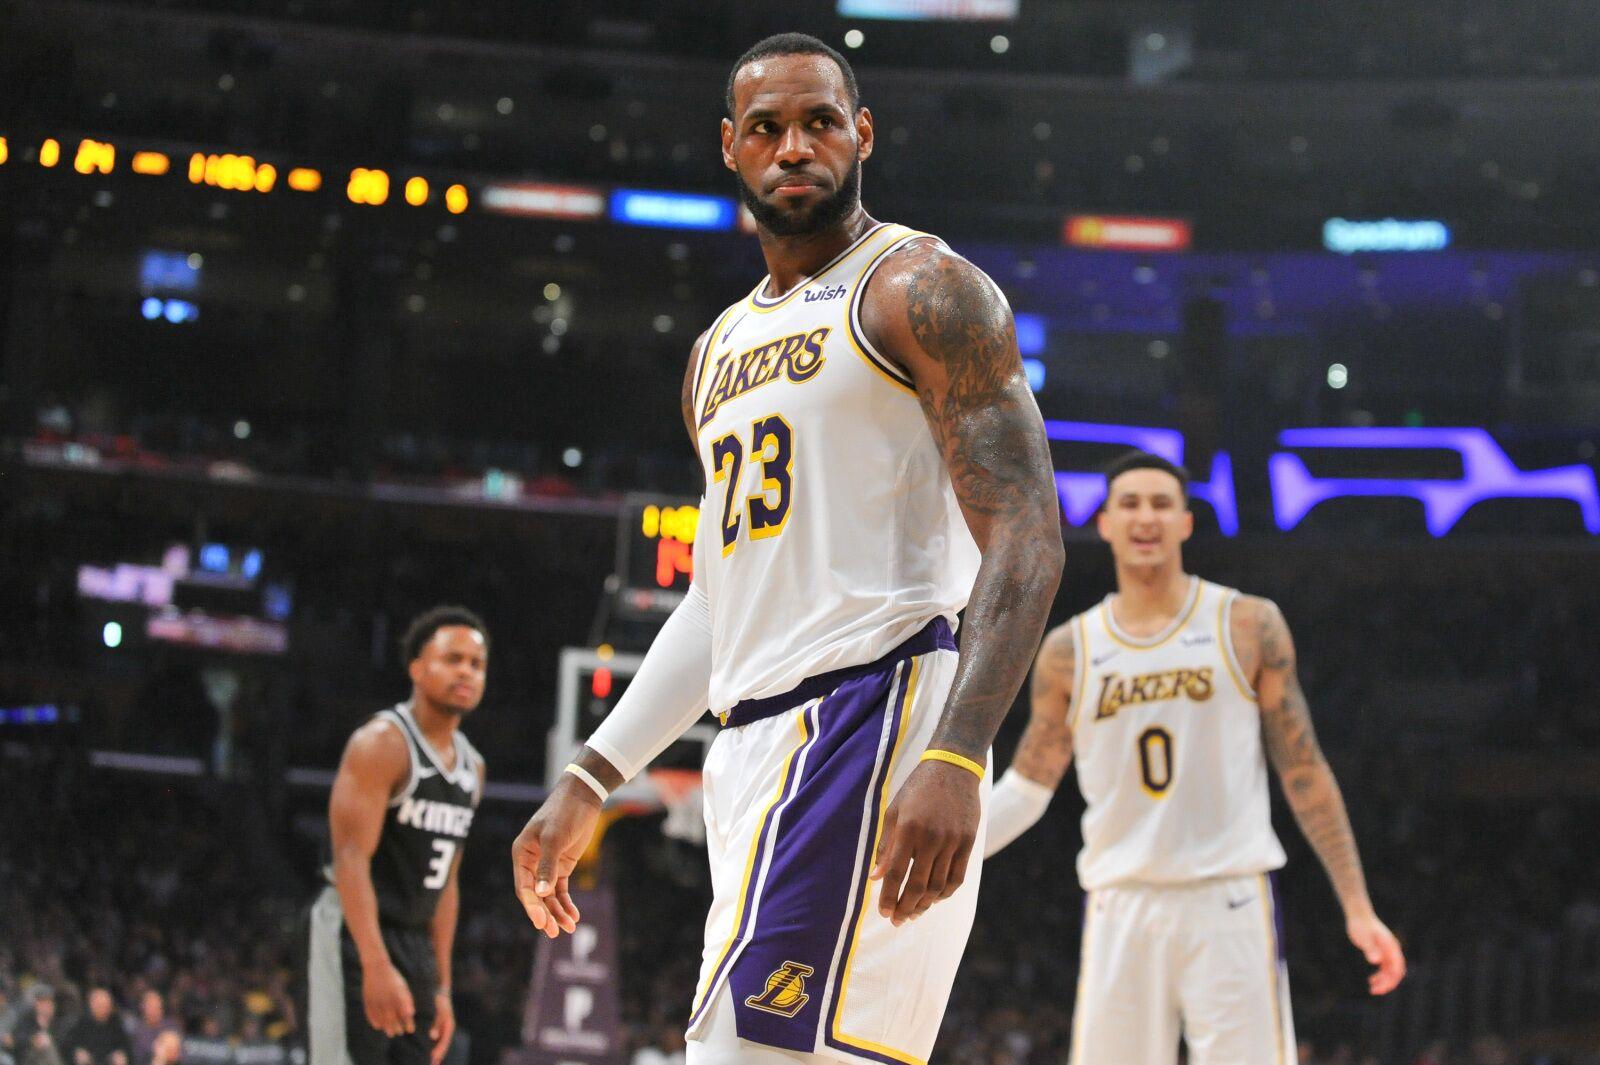 Los Angeles Lakers: Game 12 preview vs. Sacramento Kings